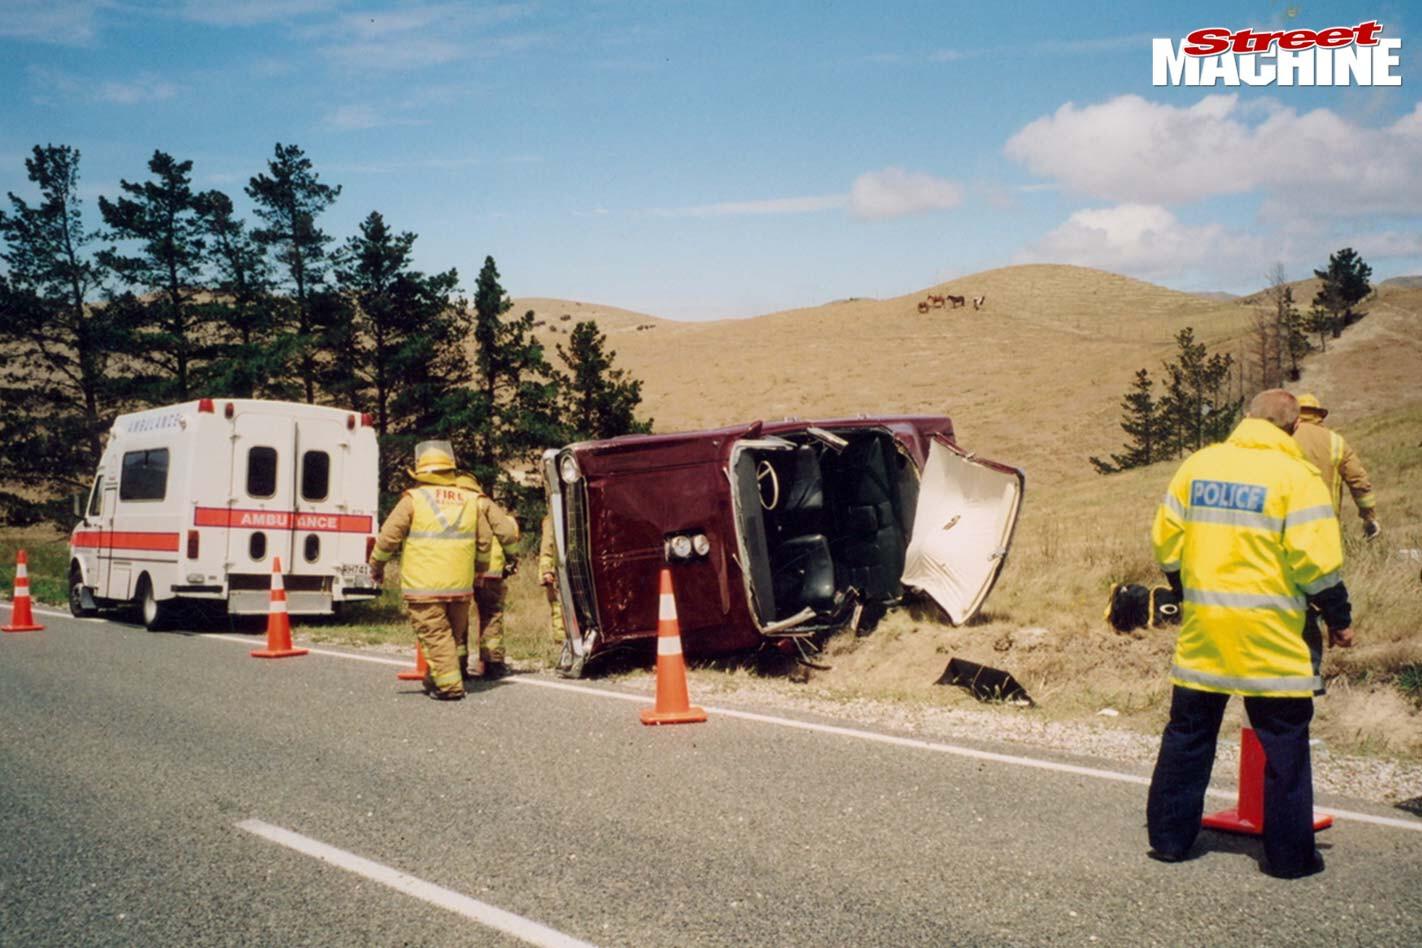 Ford Falcon accident